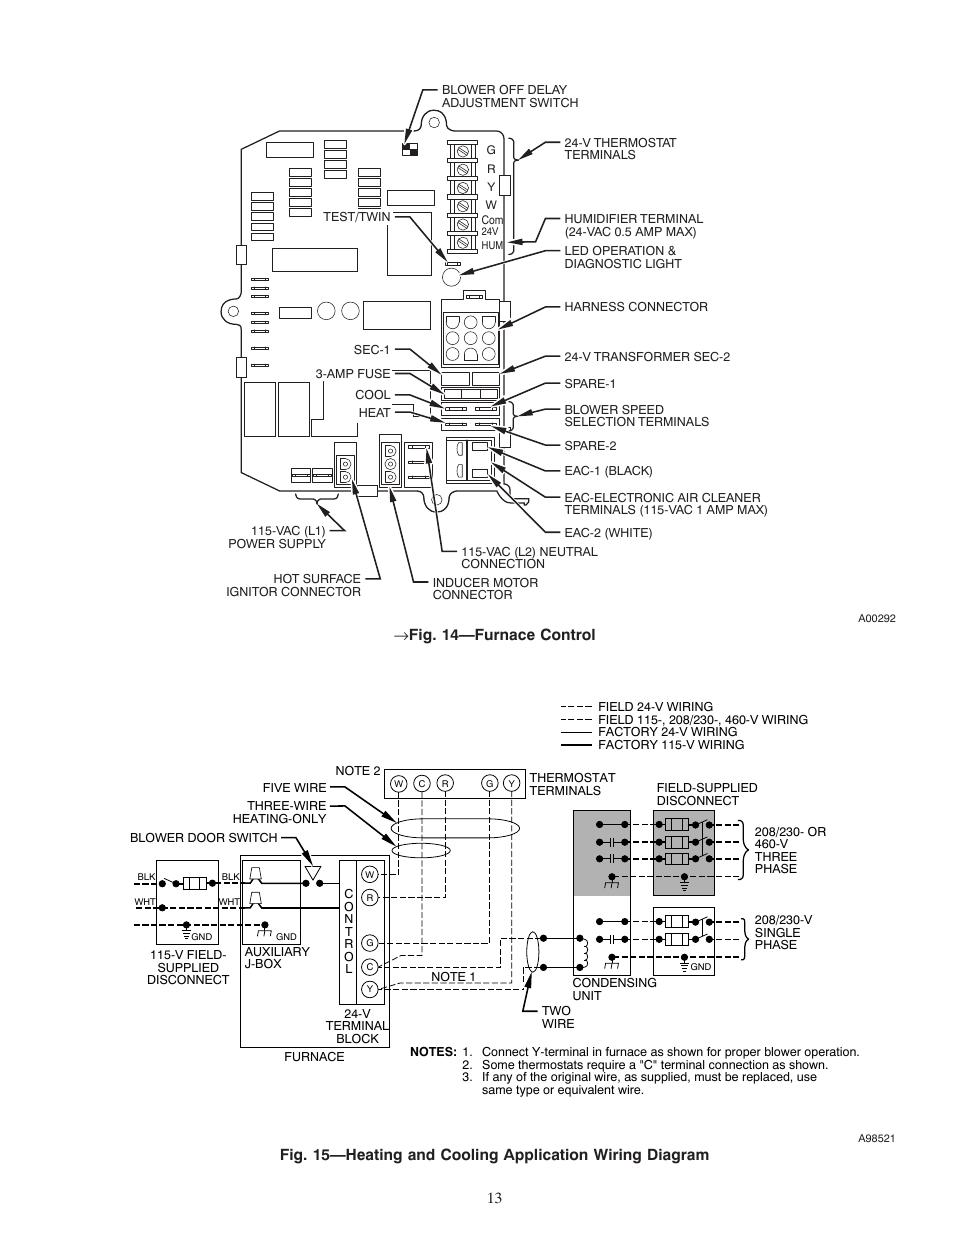 general electric furnace wiring diagram eb158  general